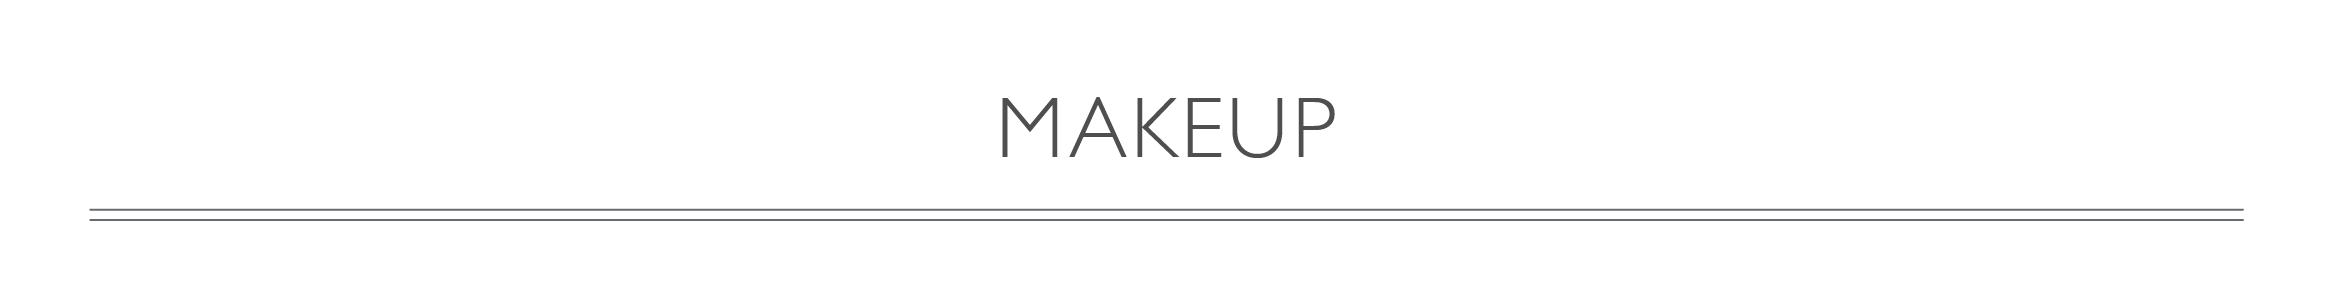 spa_vs_banner_makeup.png